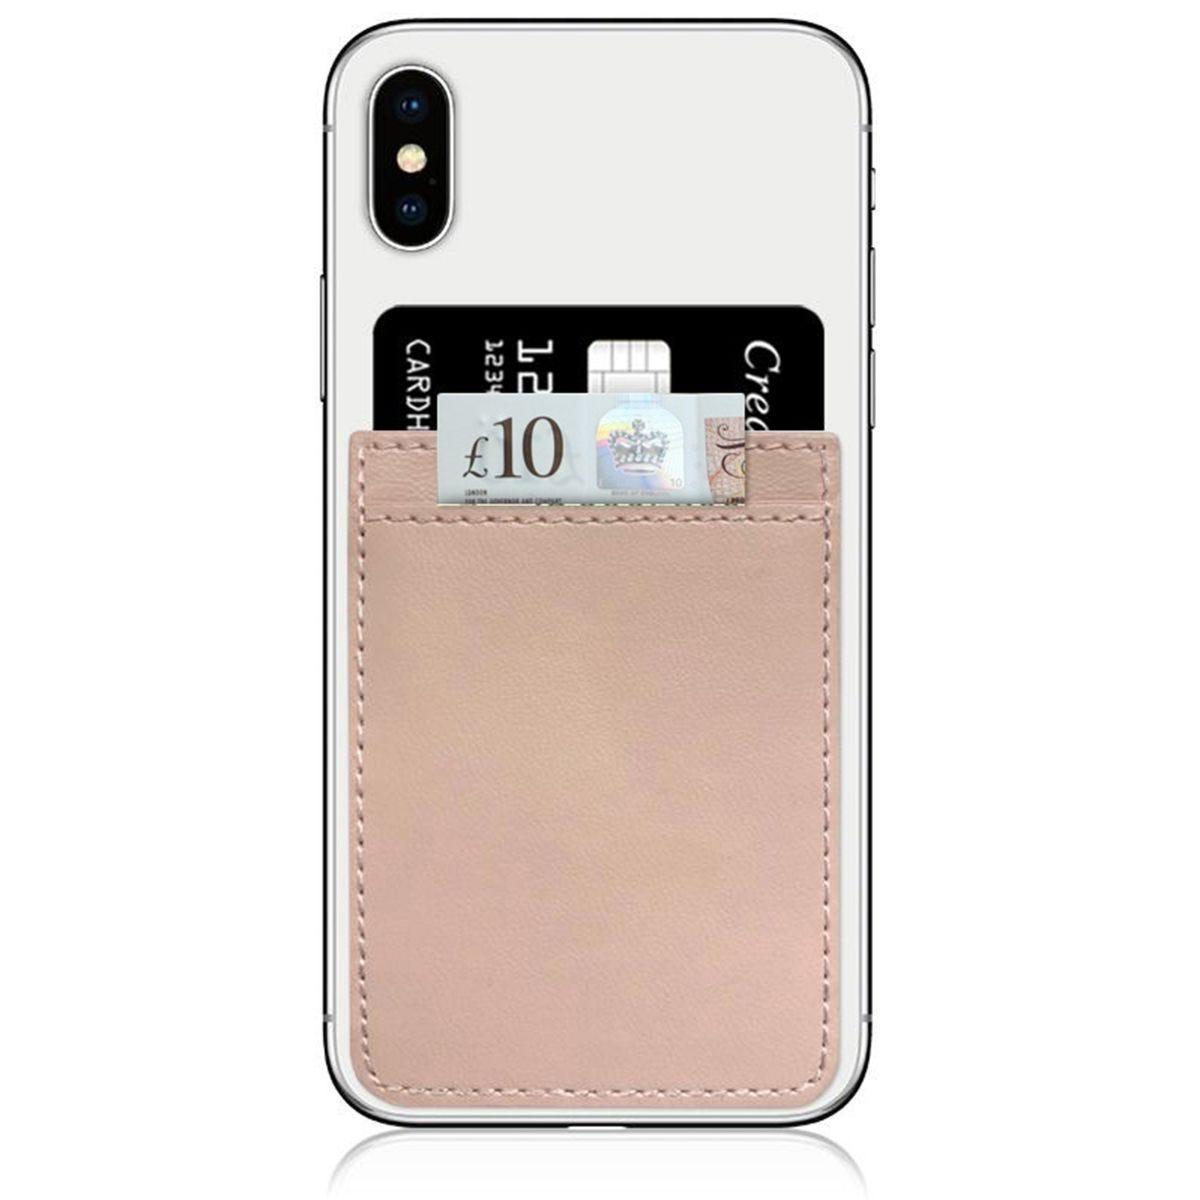 iDecoz Nude Phone Pocket